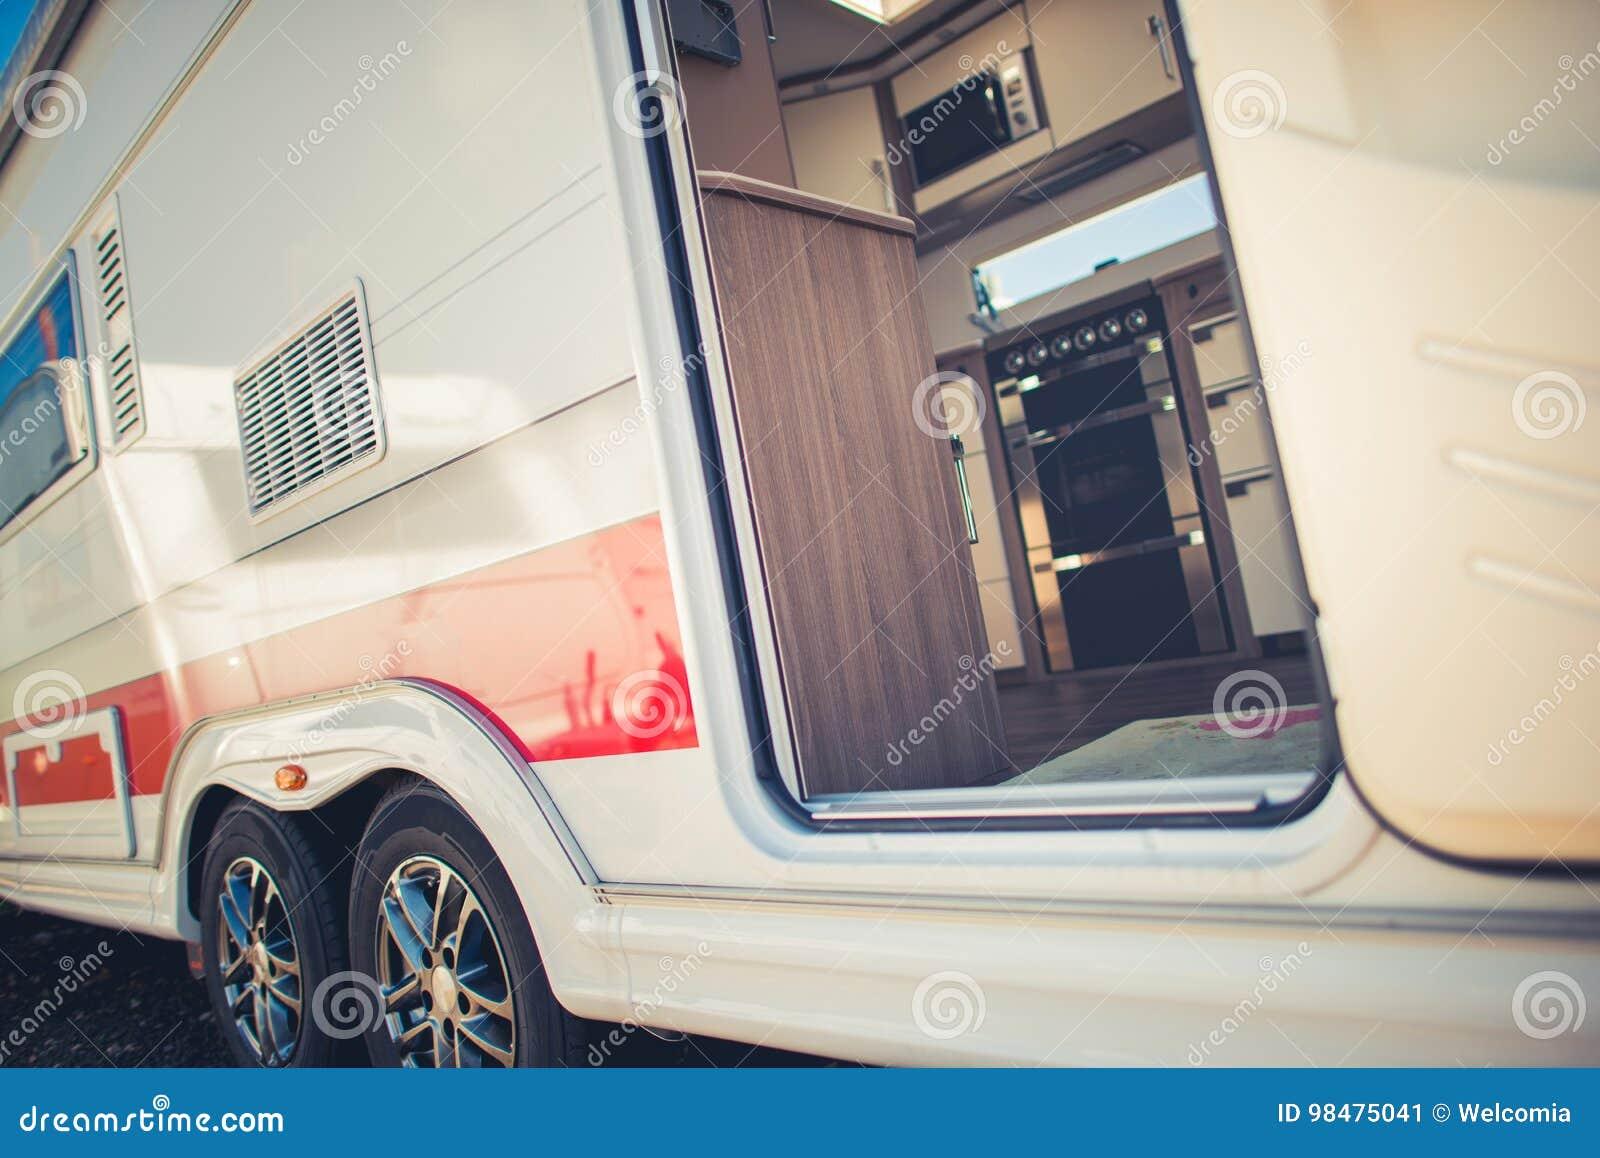 modern travel trailer camping stock image - image of trailer, door